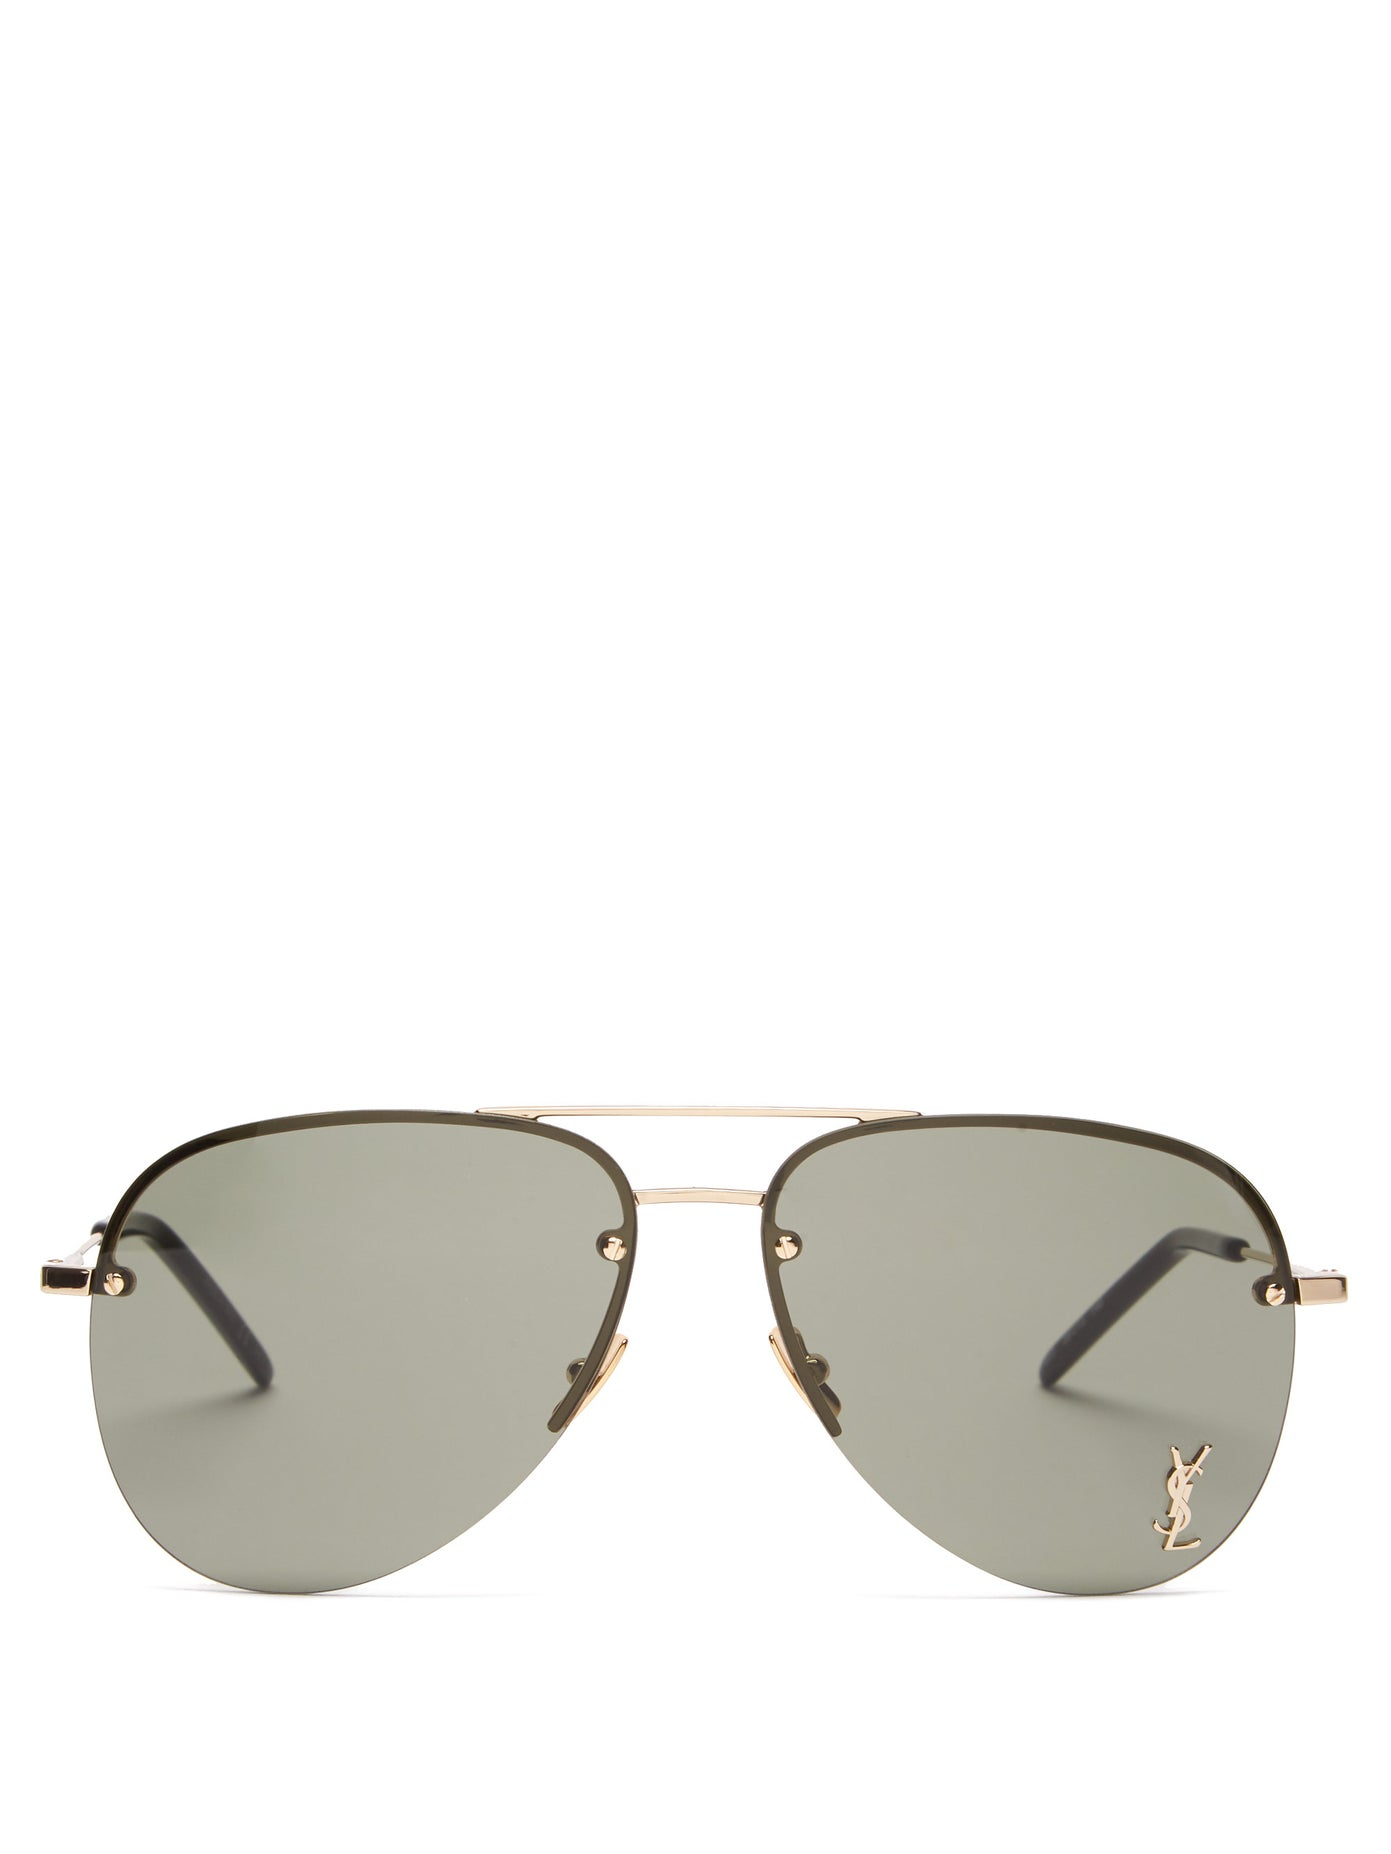 Saint Laurent — Aviator Metal Sunglasses